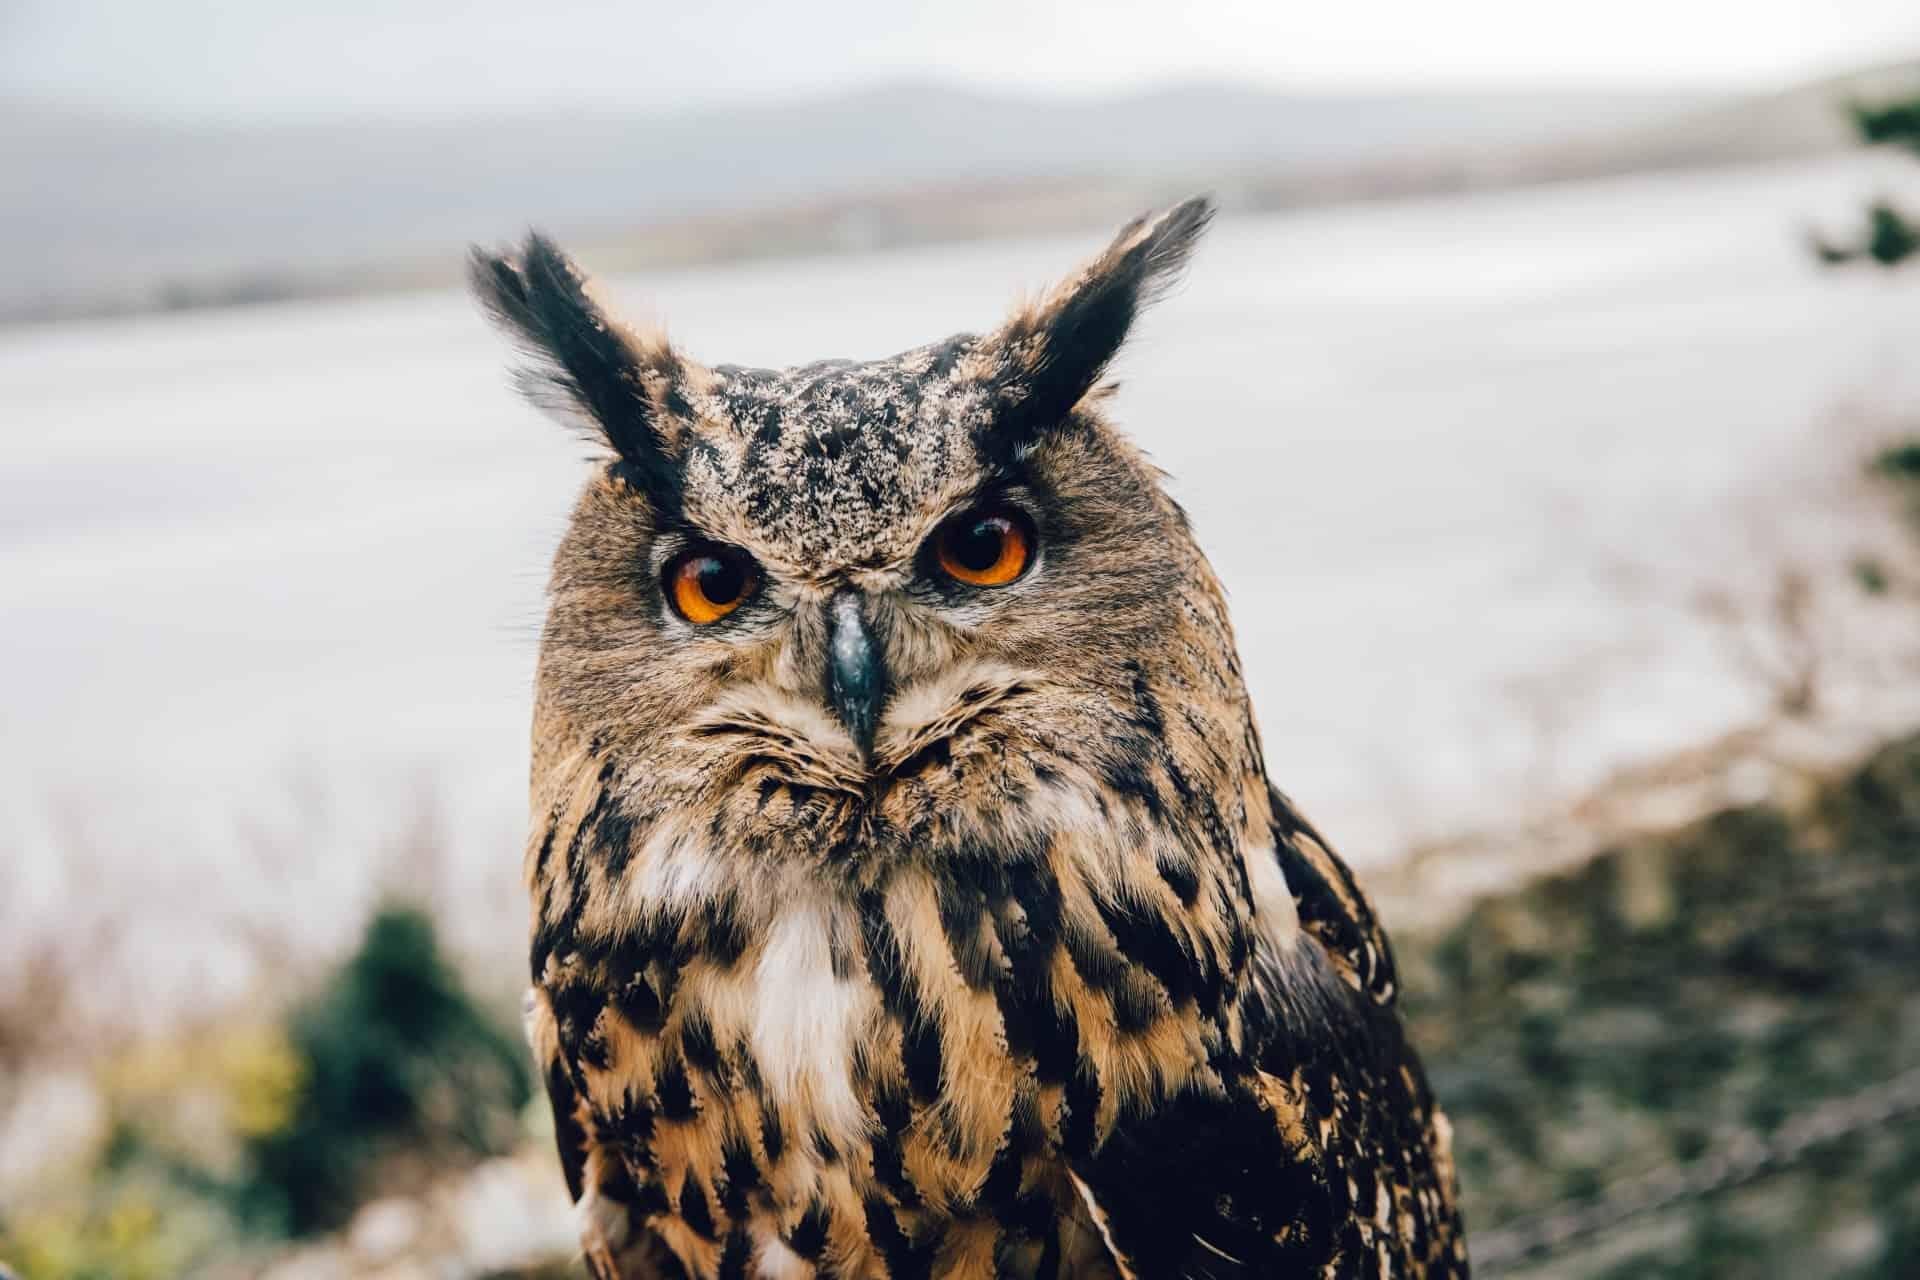 Bird of Prey - Eagle owl